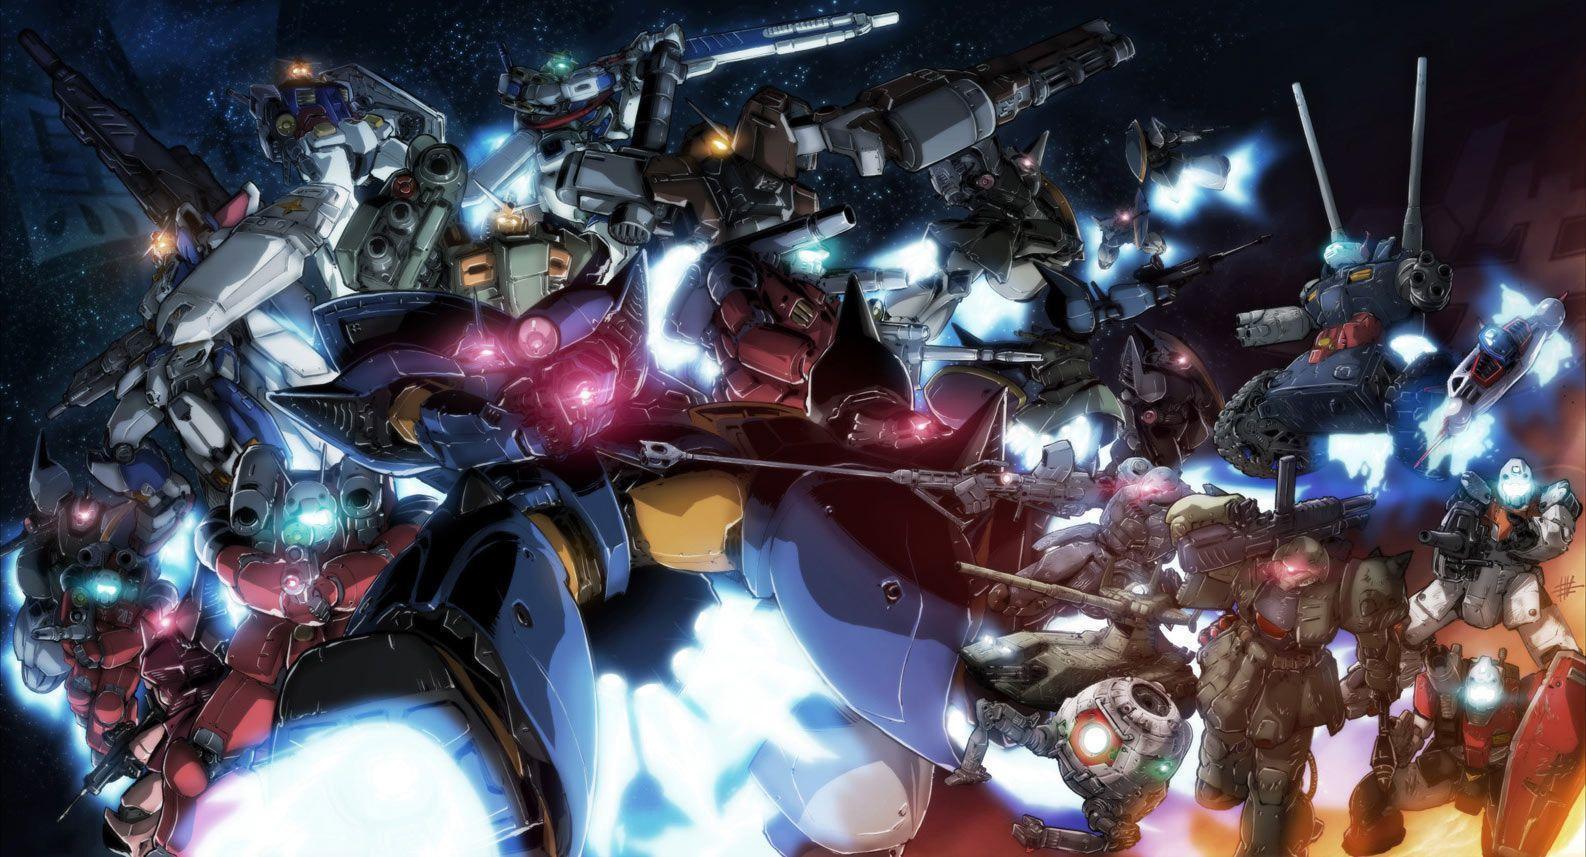 Mobile Fighter G Gundam Wallpapers 1586x857